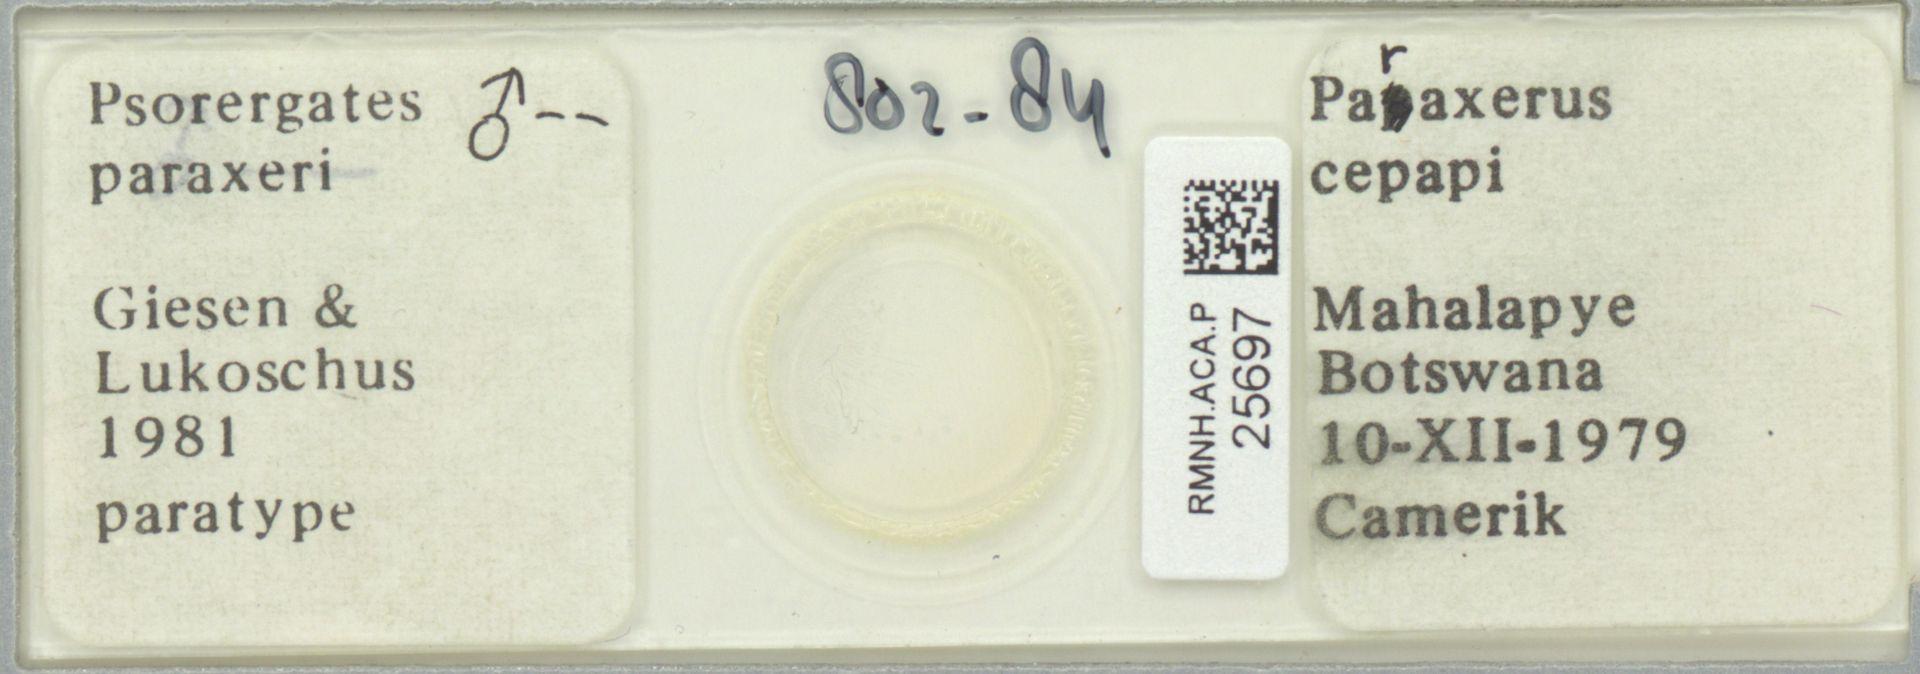 RMNH.ACA.P.25697 | Psorergates paraxeri Giesen & Lukoschus 1981